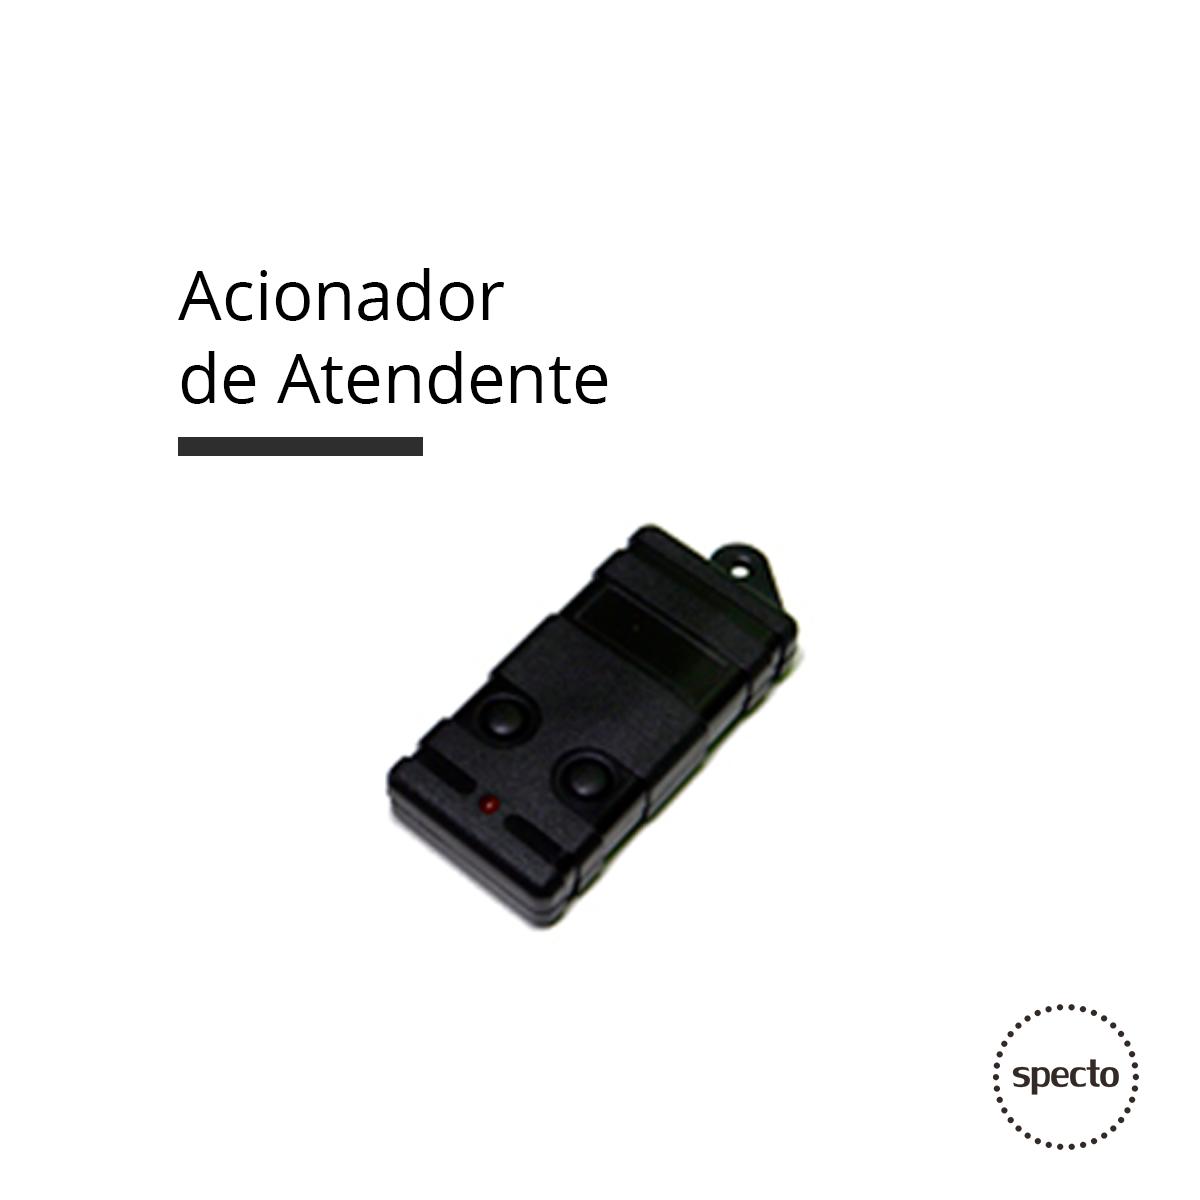 Acionador de Atendente via RF (Controle Remoto)  -  Specto Tecnologia